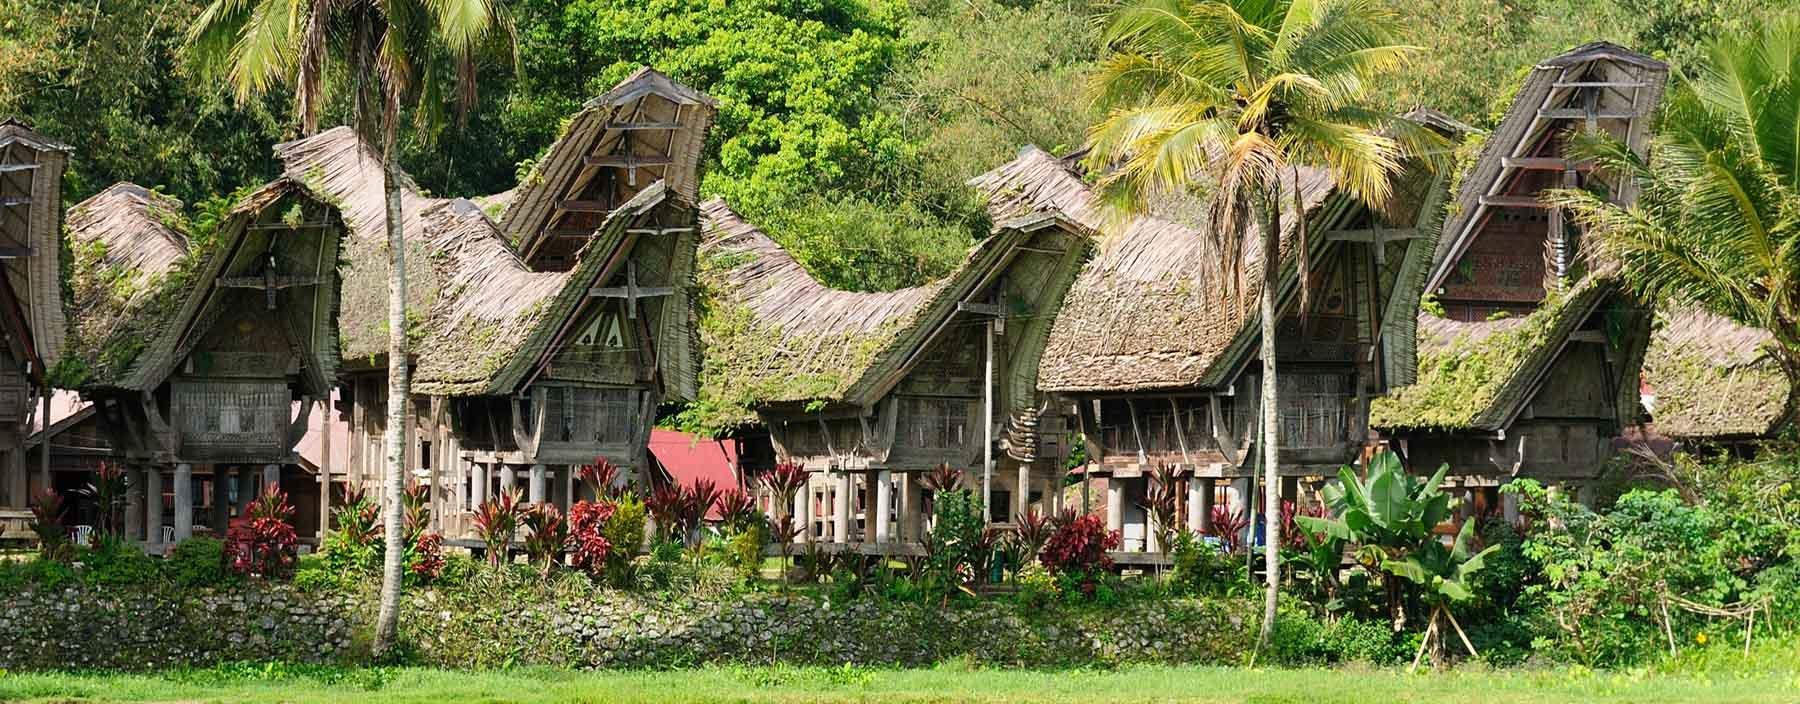 id, sulawesi, tana toraja, kete kesu village (3).jpg